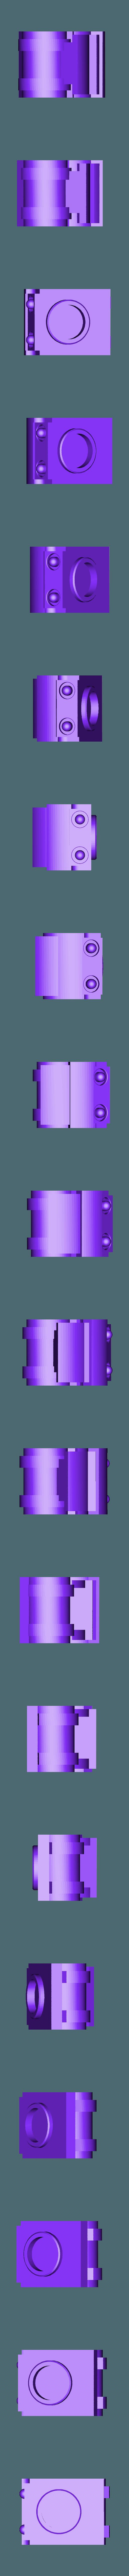 Leviathan_dreadnought_articulation_bras_v4.STL Download free STL file Gros robot des anciens marin de l'espace • Template to 3D print, ologhzul